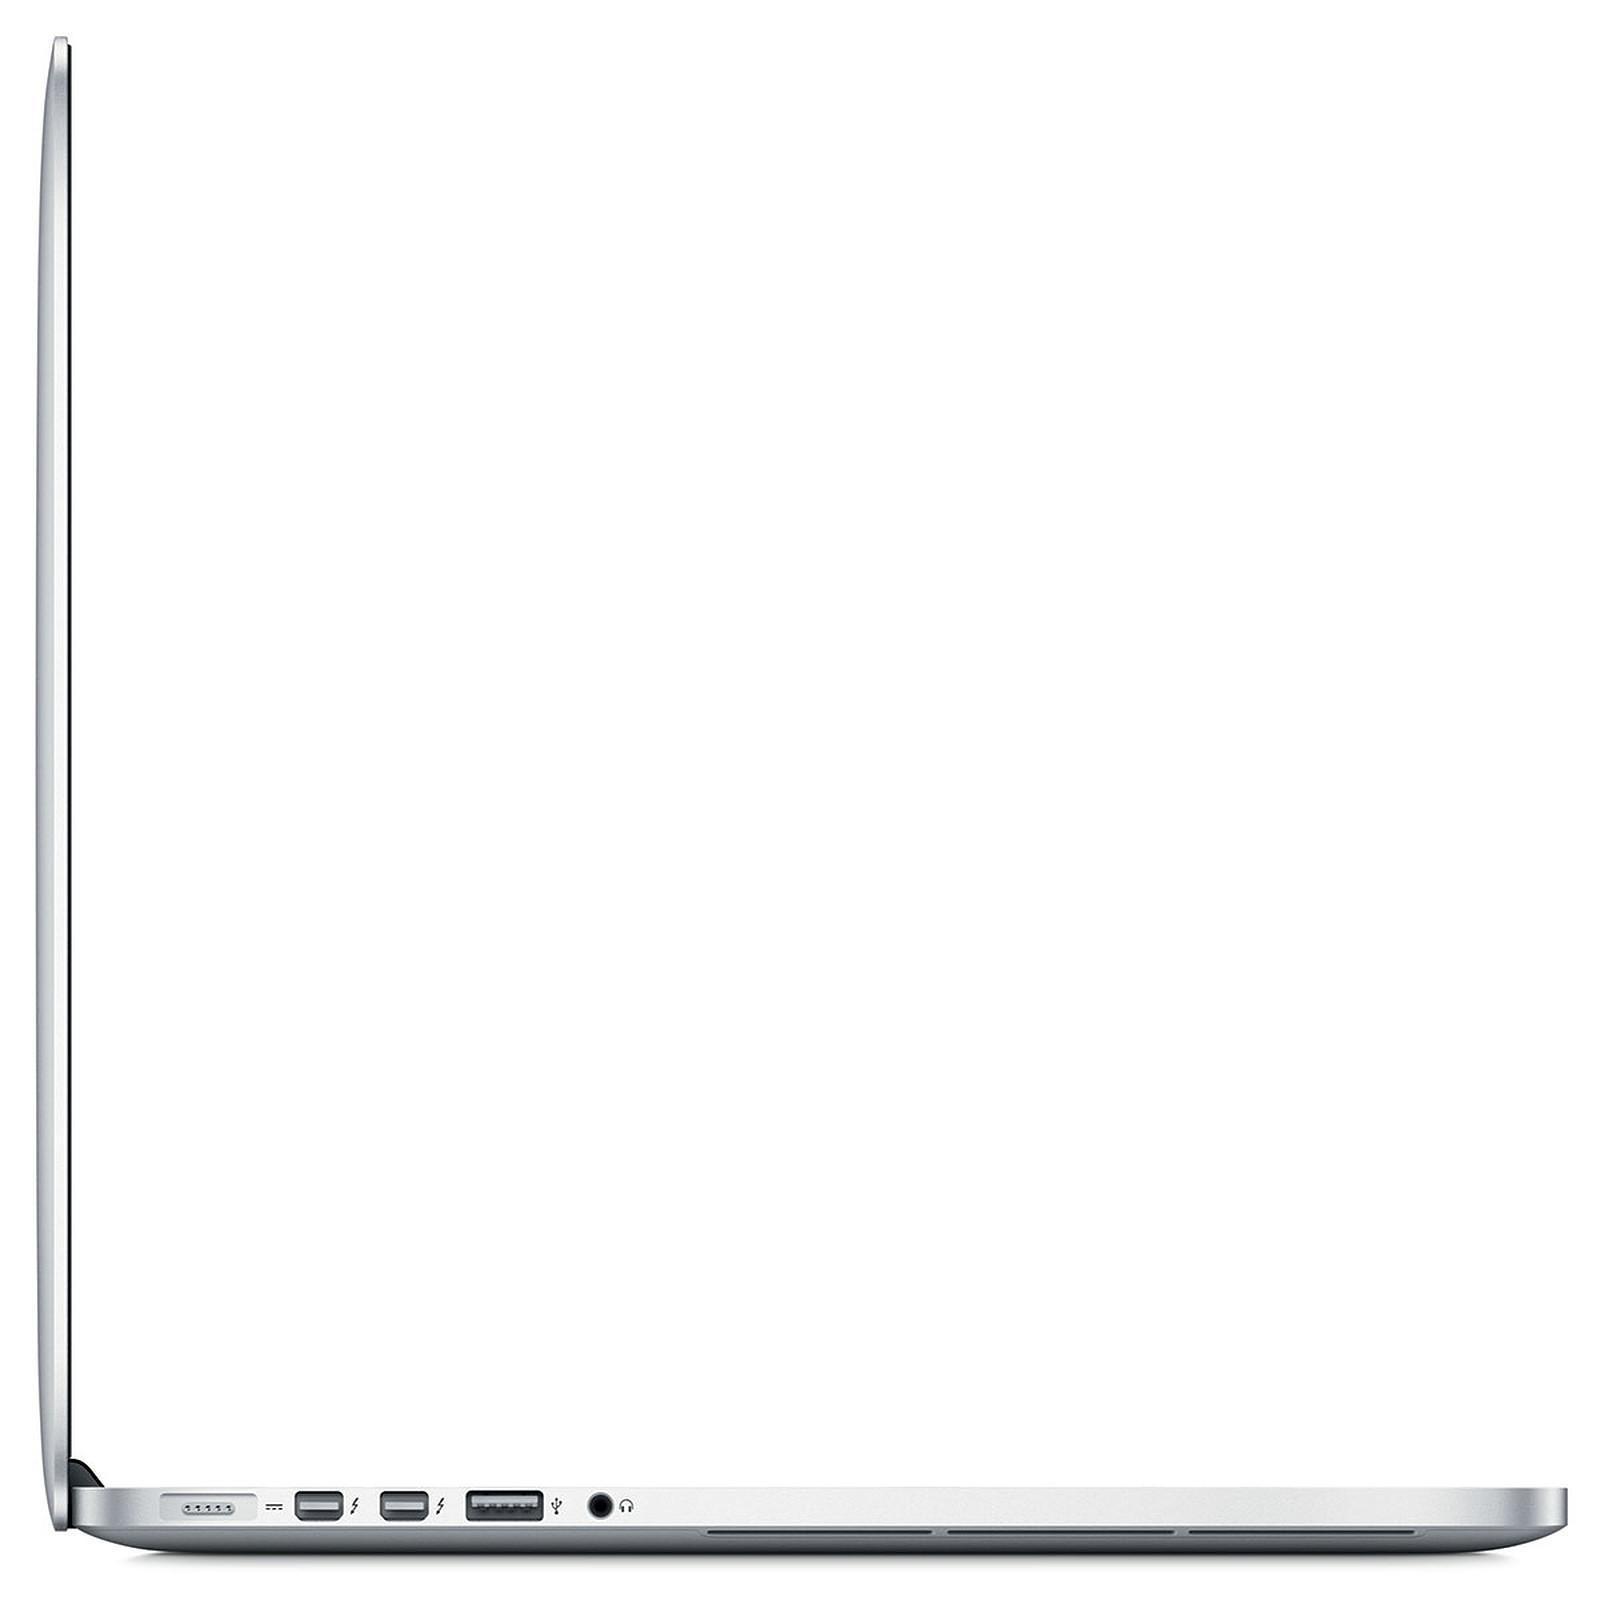 MacBook Pro Retina 15,4-tum (2014) - Core i7 - 16GB - SSD 512 GB QWERTY - Nederländska